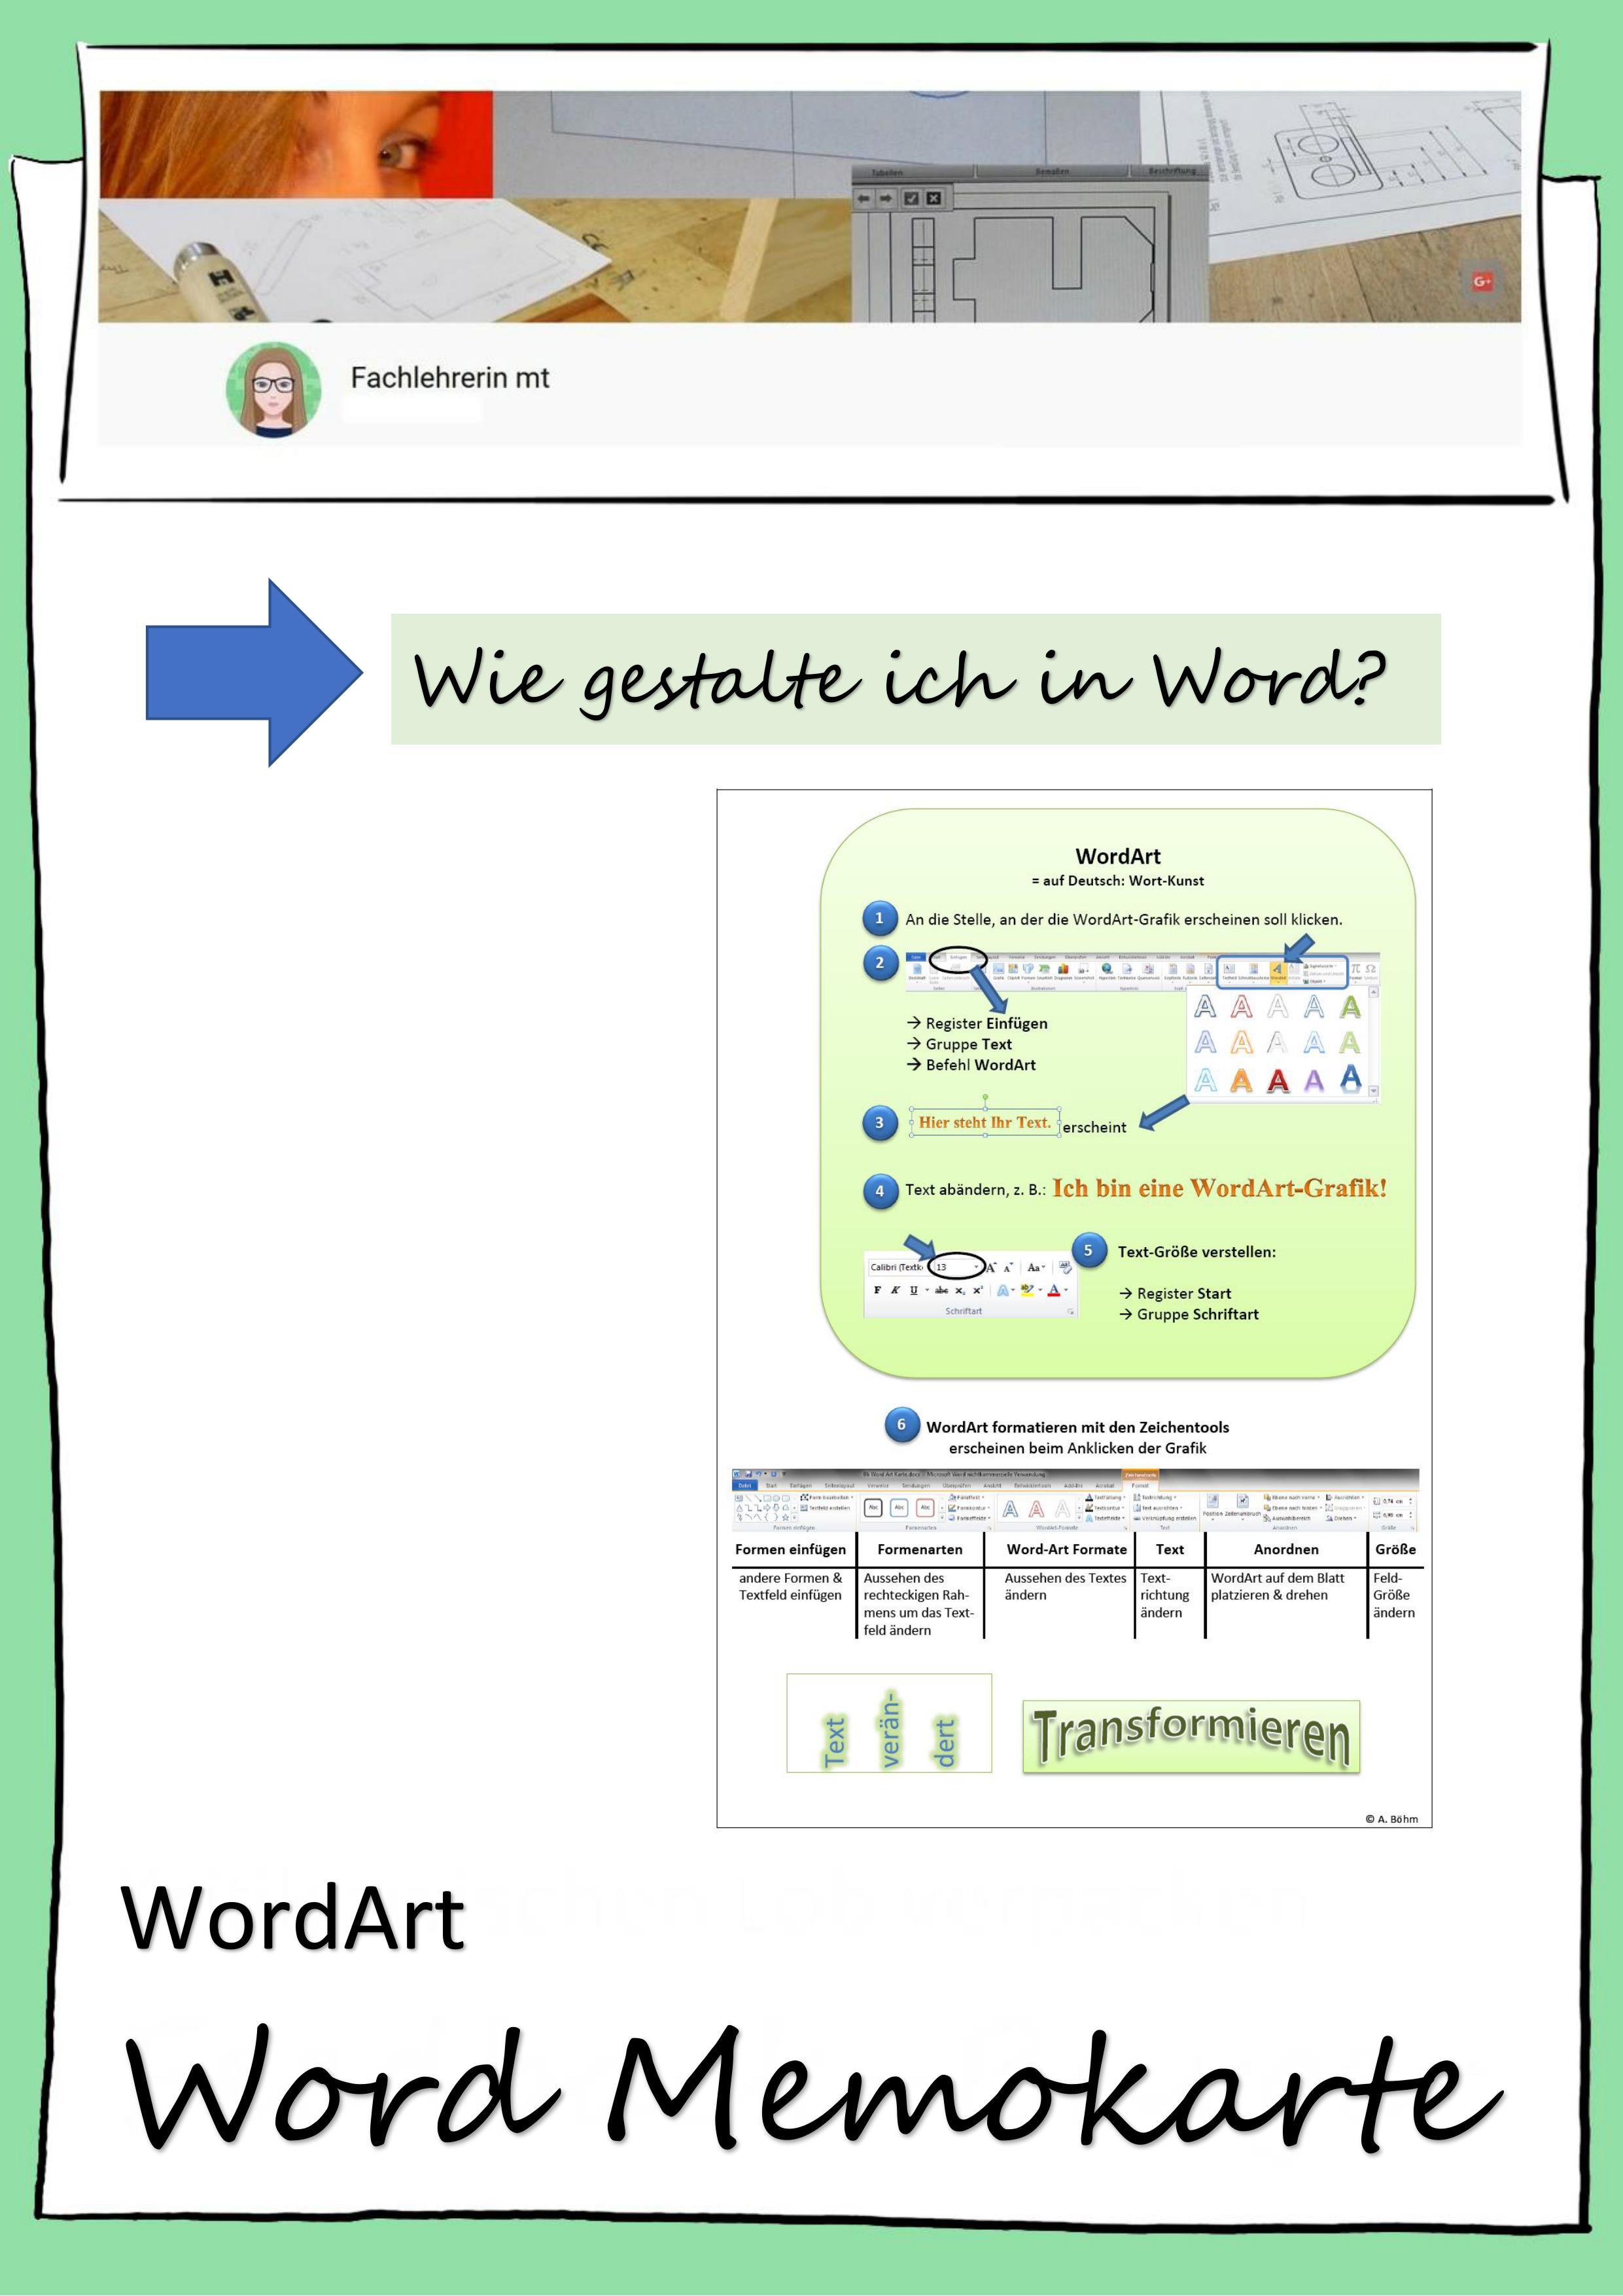 Microsoft Word Memokarte Wordart Unterrichtsmaterial Im Fach Informatik Itg Microsoft Word Unterrichtsmaterial Microsoft